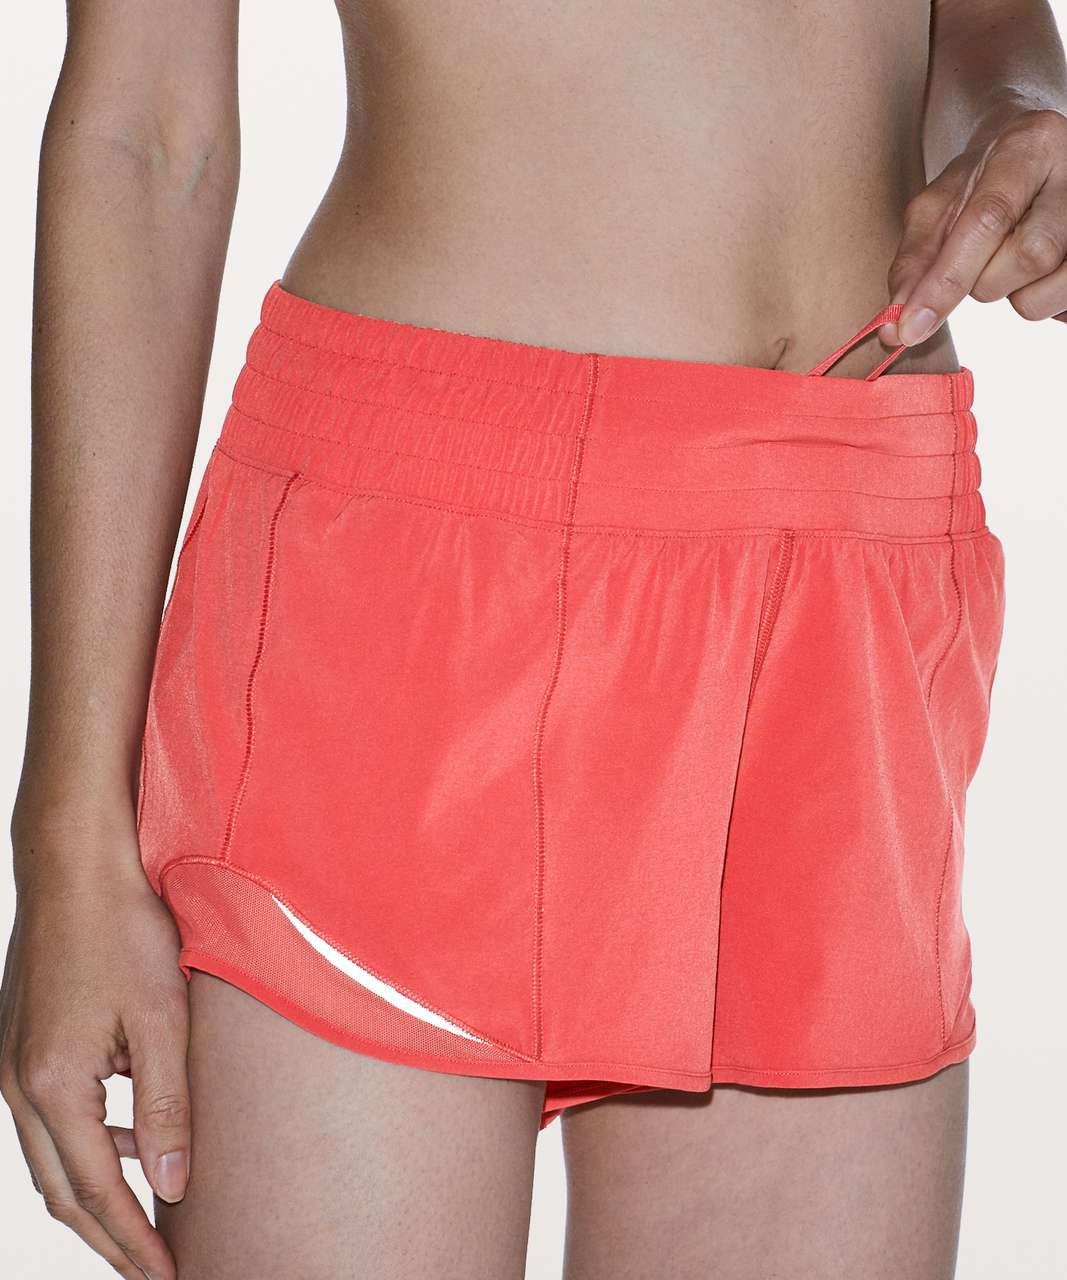 "Lululemon Hotty Hot Short *High-Rise 2.5"" - Poppy Coral"